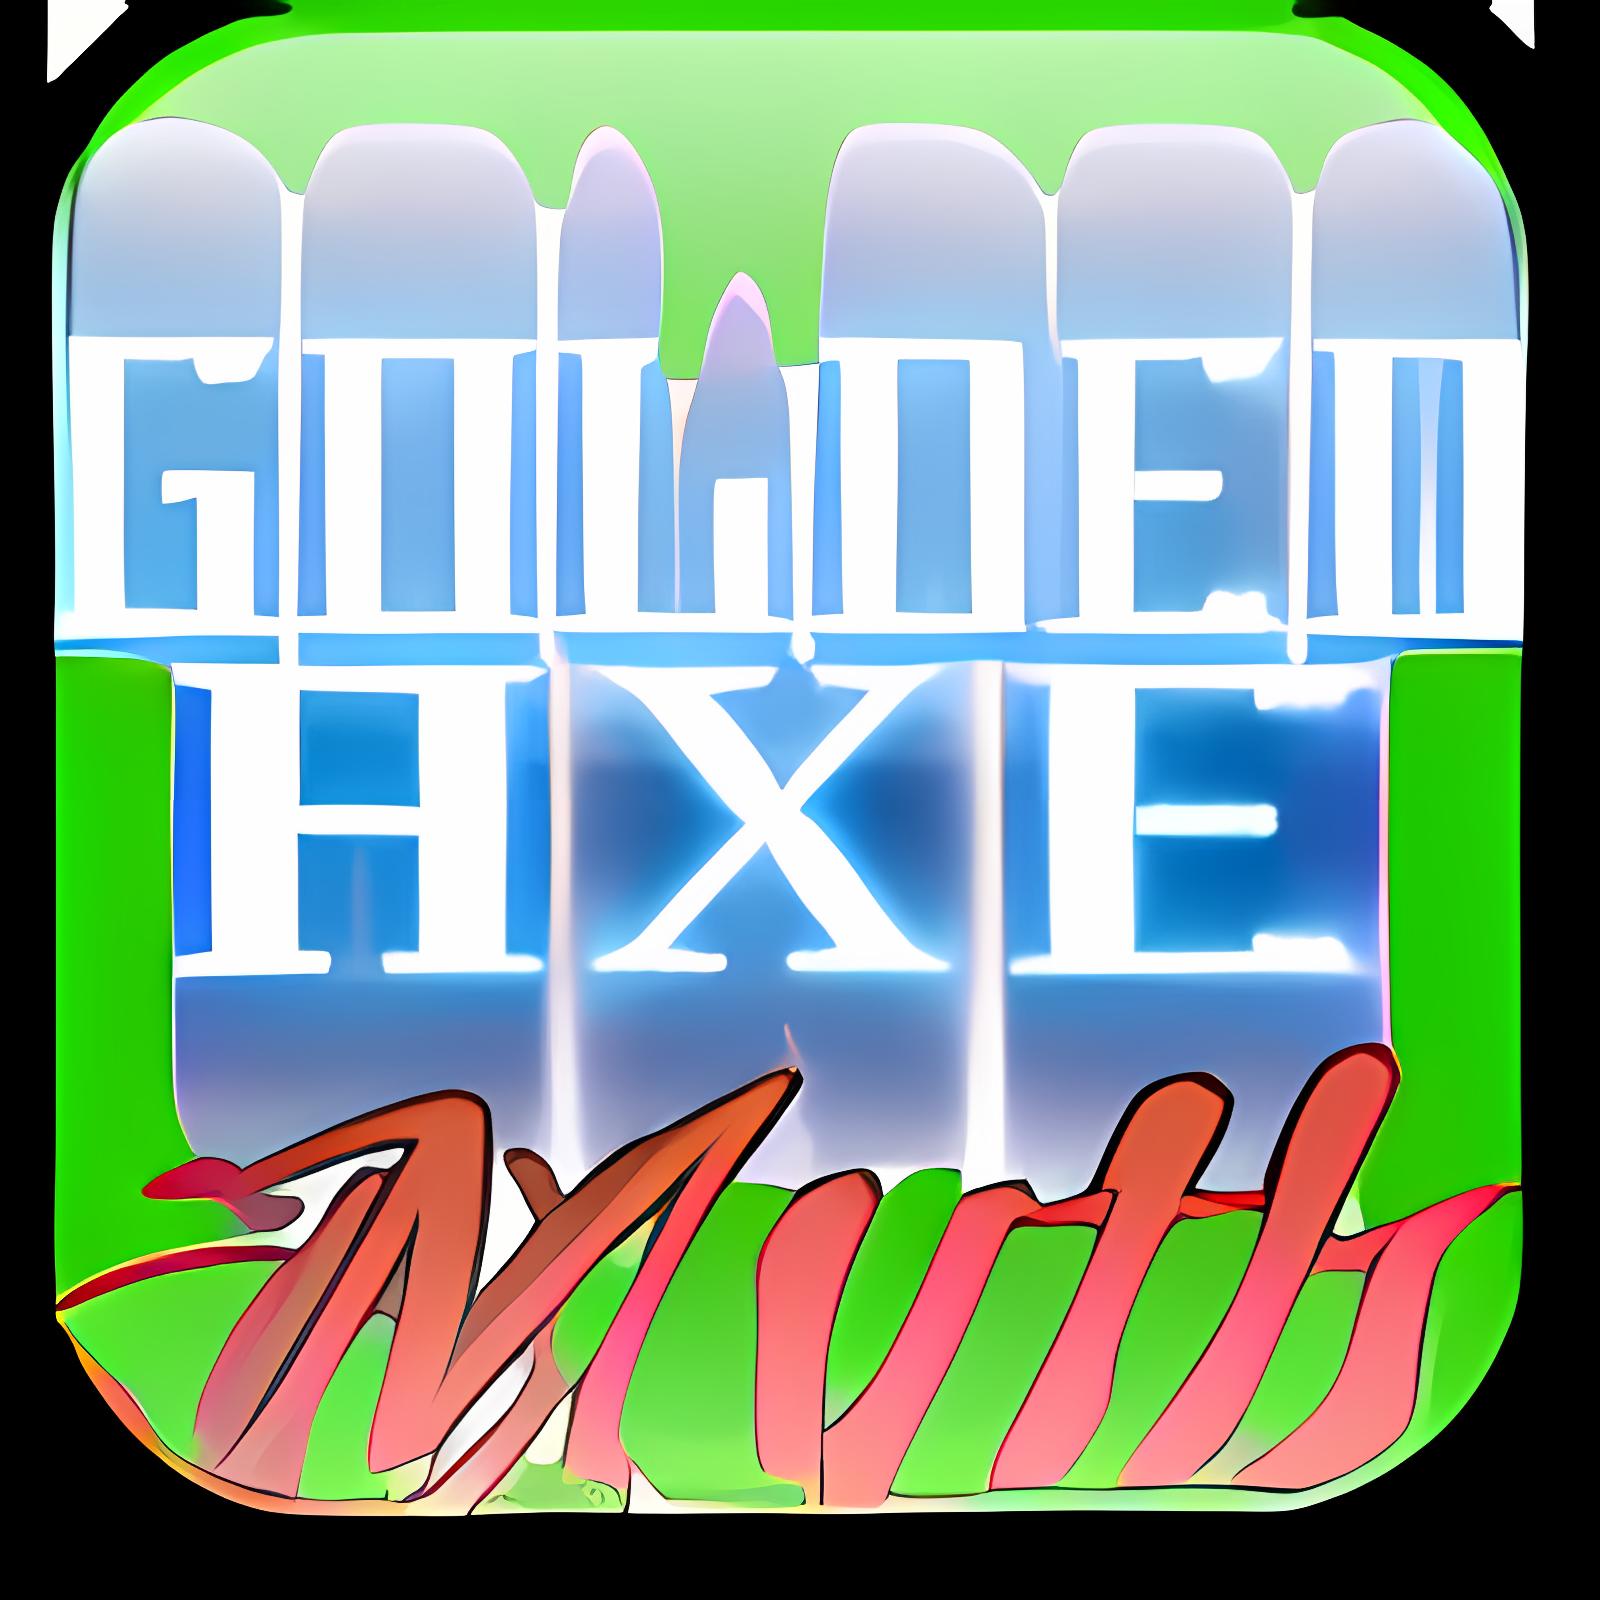 Golden Axe Myths